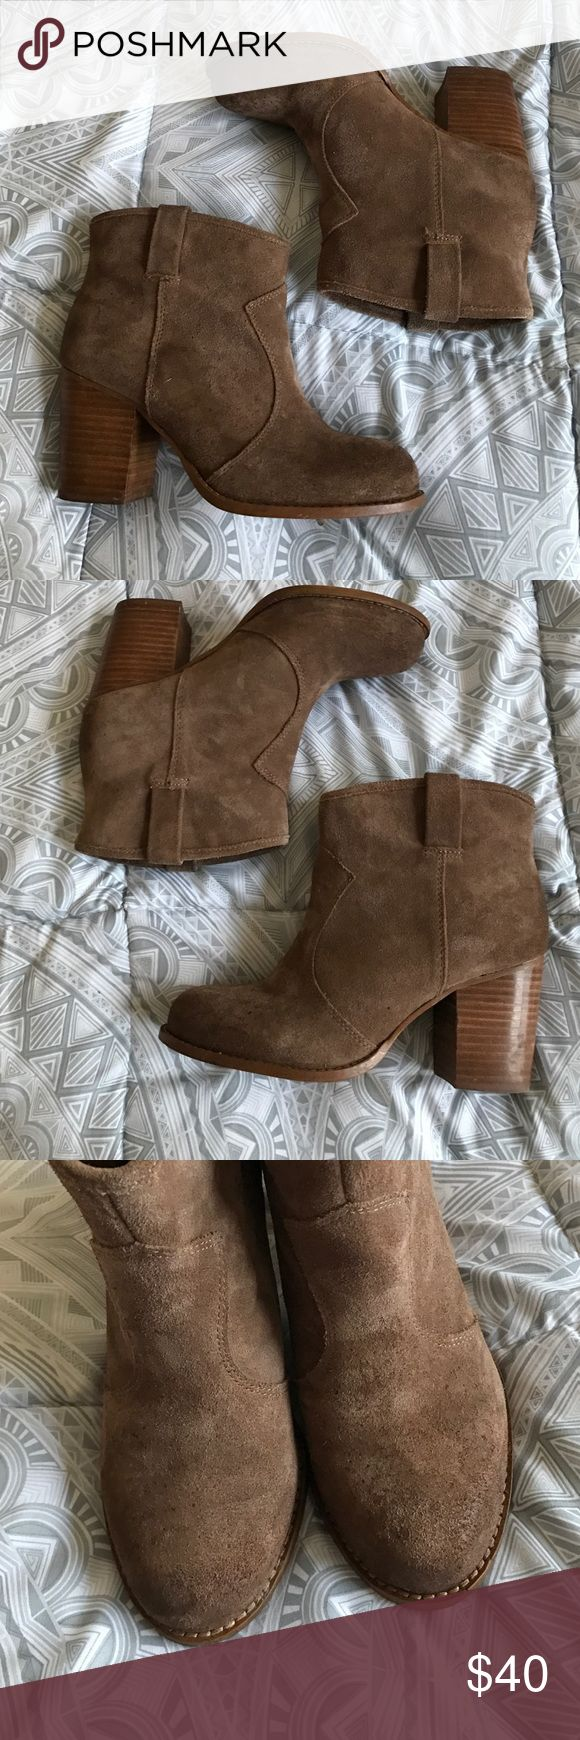 "Splendid Lakota Booties Used Splendid Lakota booties- please note wear on the toes in photo 3! Stacked 3"" block heel. The color is more of a dark sandy tan. Splendid Shoes Ankle Boots & Booties"